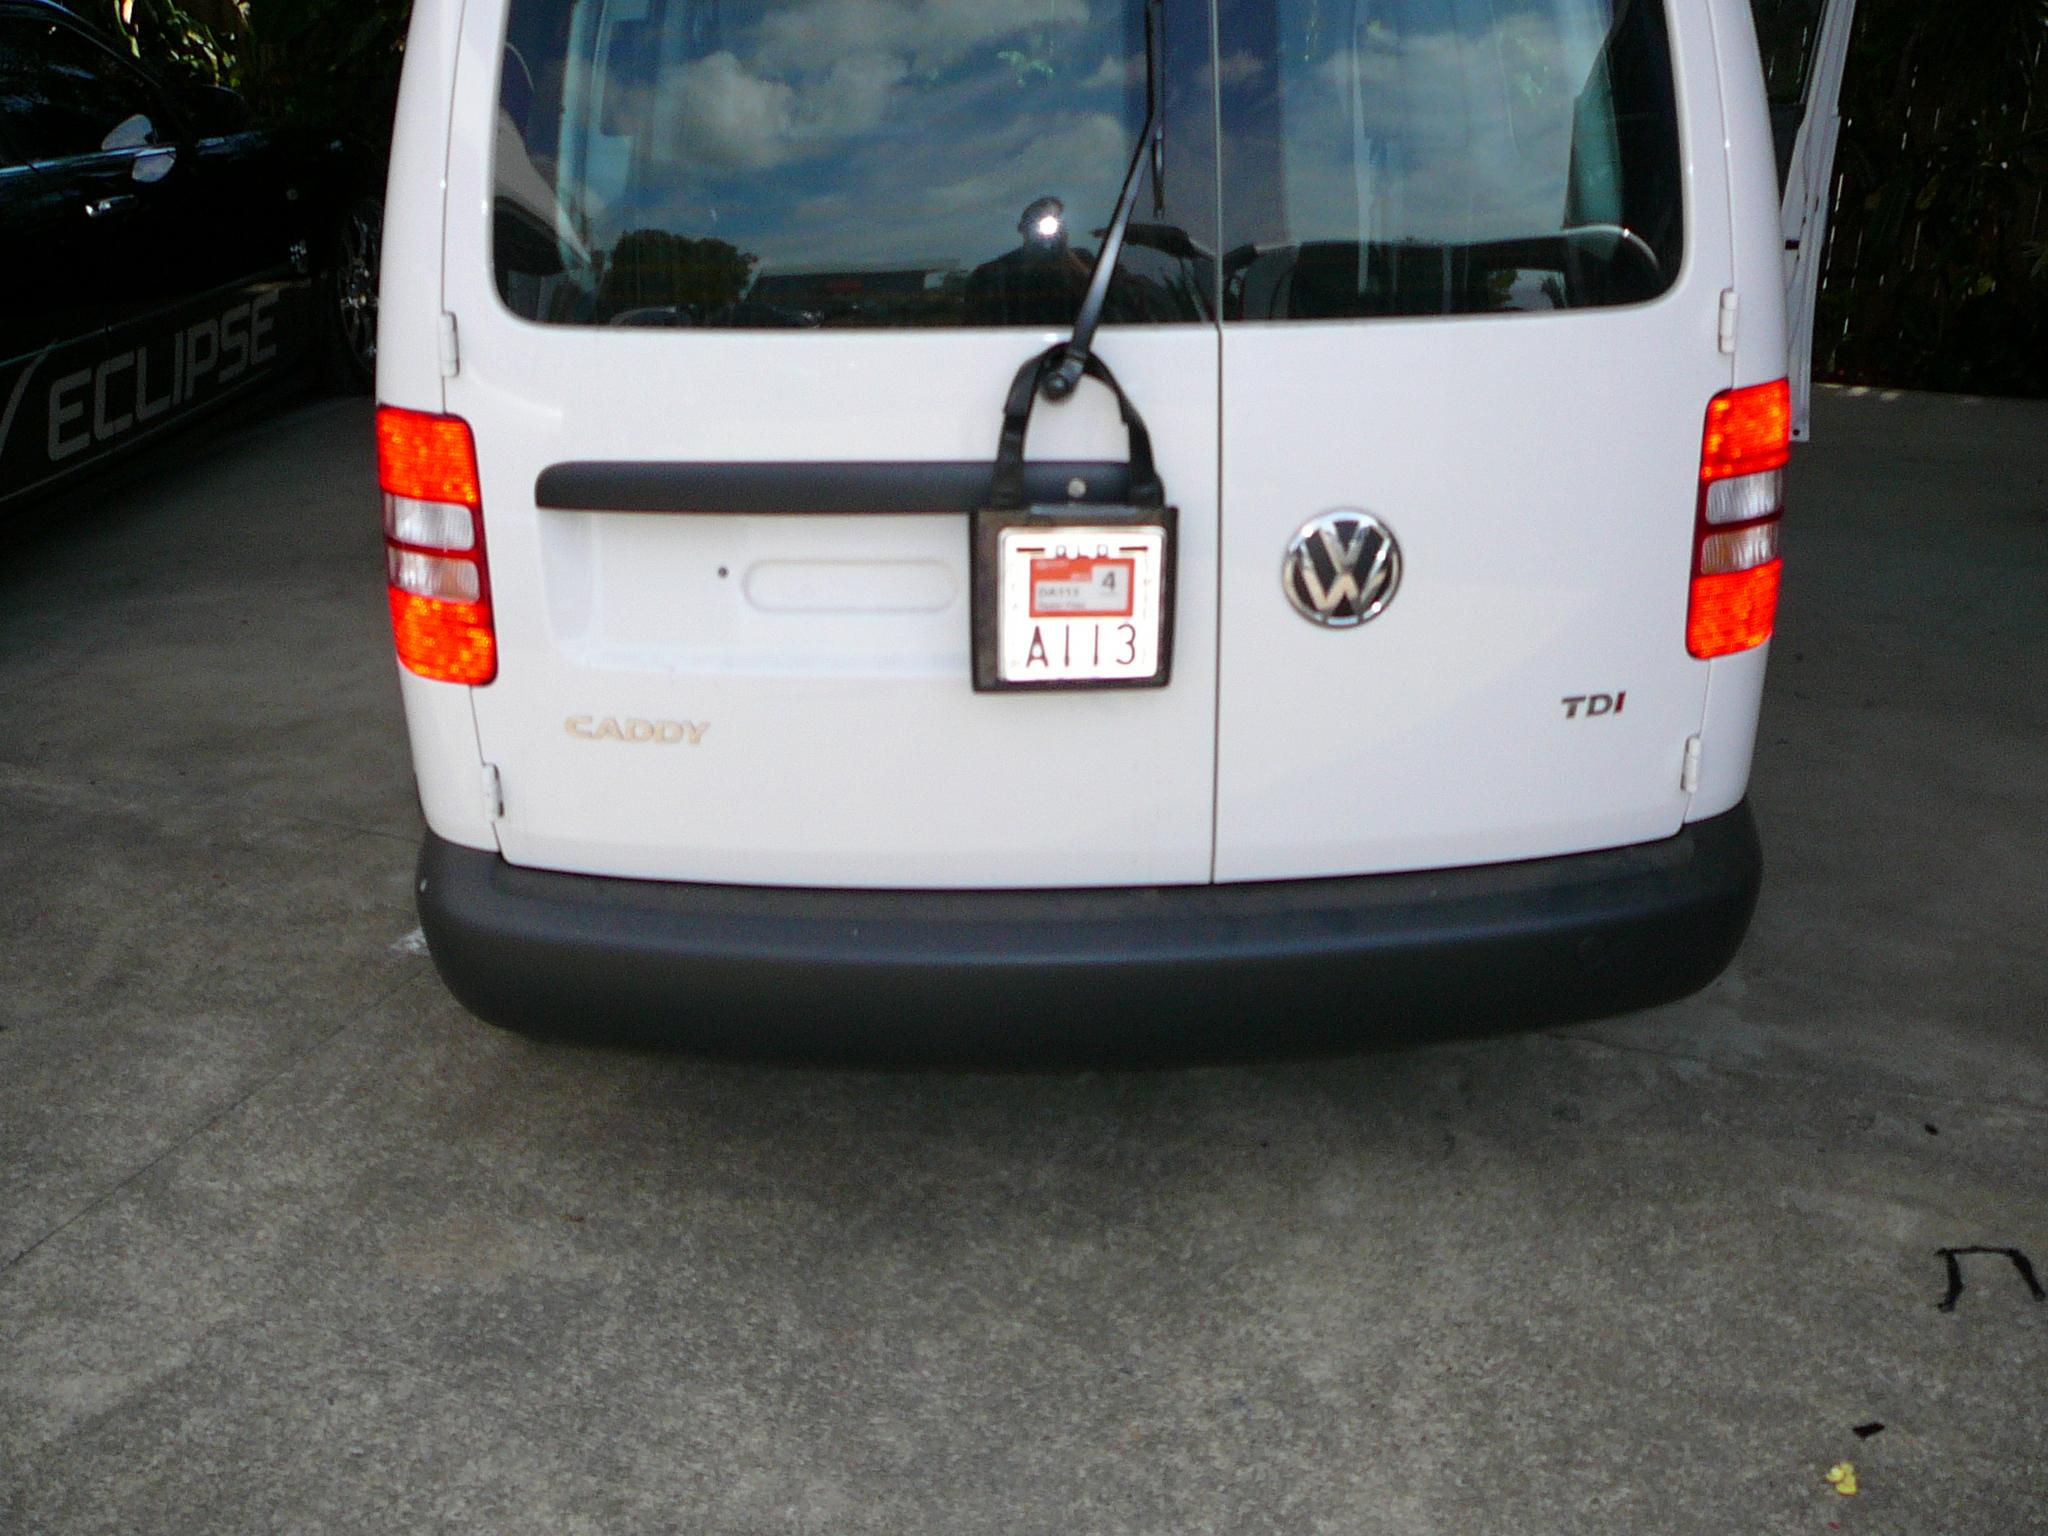 VW Caddy 2011, Parrot phone kit install – Maroochy Car Sound